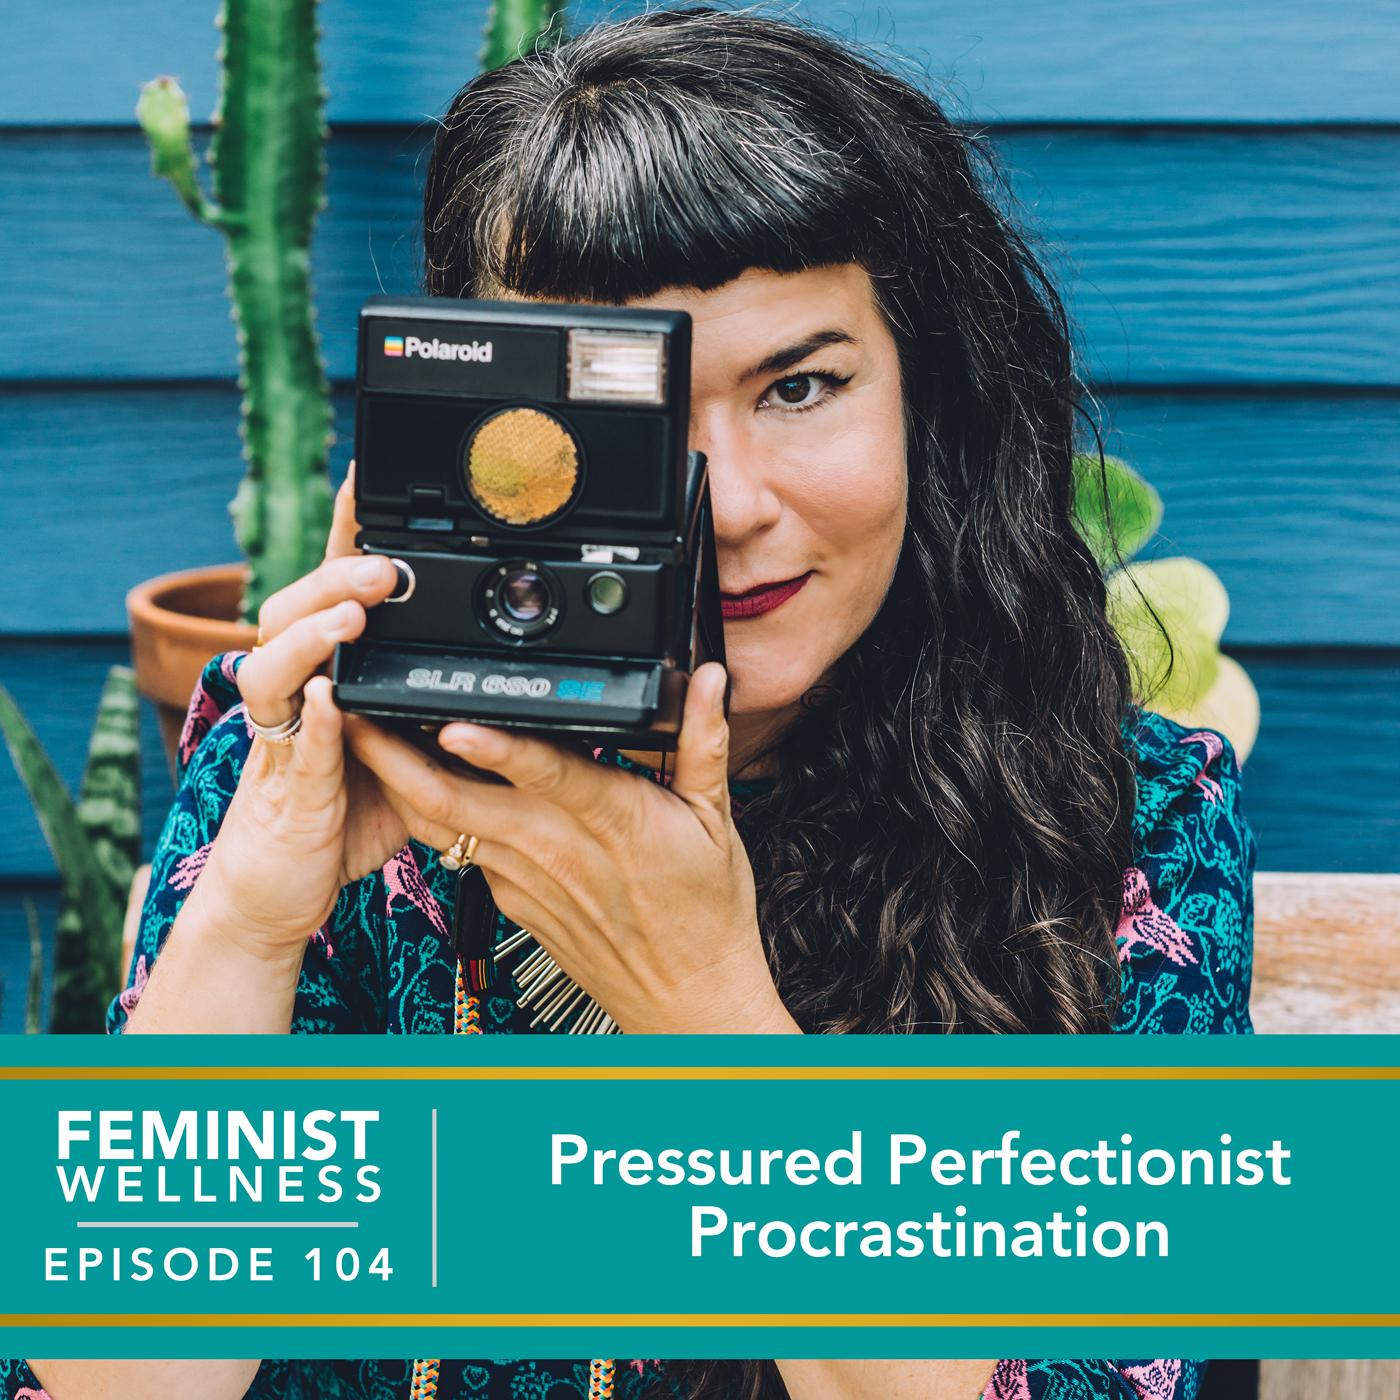 Pressured Perfectionist Procrastination